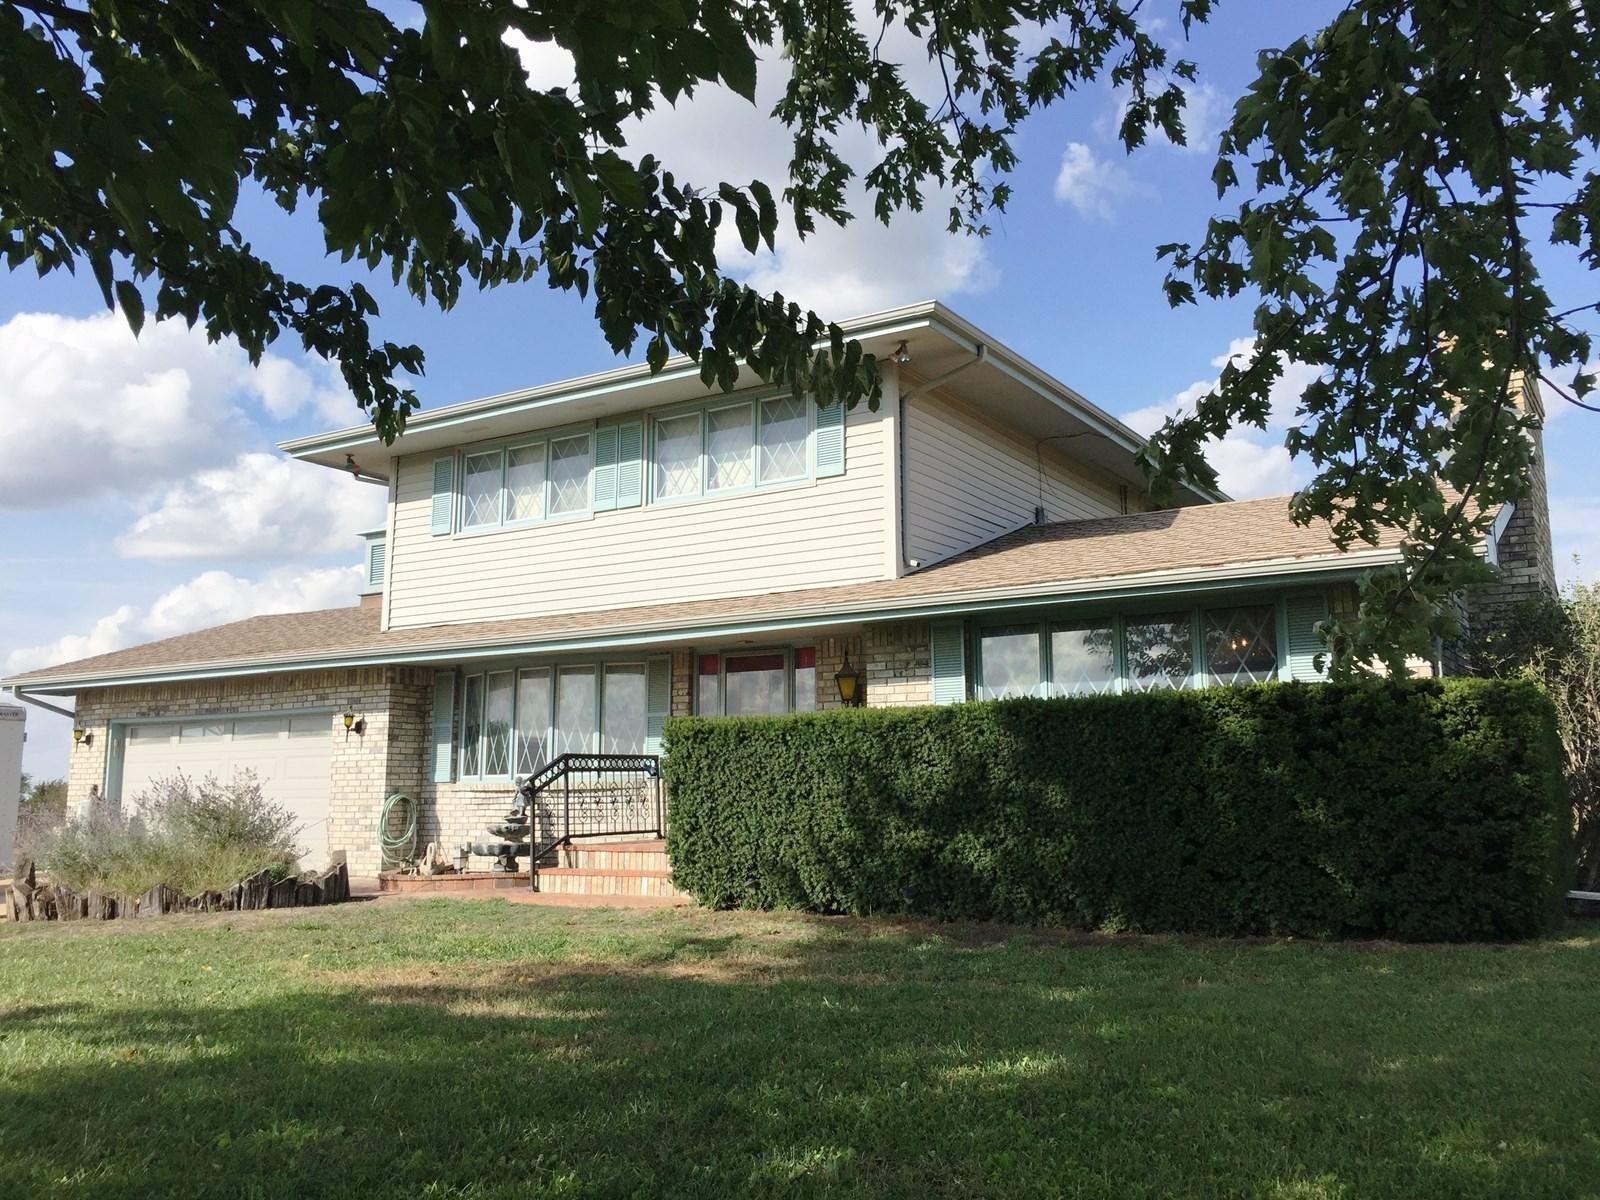 2 STORY HOME,  9.57 ACRES, GREAT LOCATION, WICHITA, KS